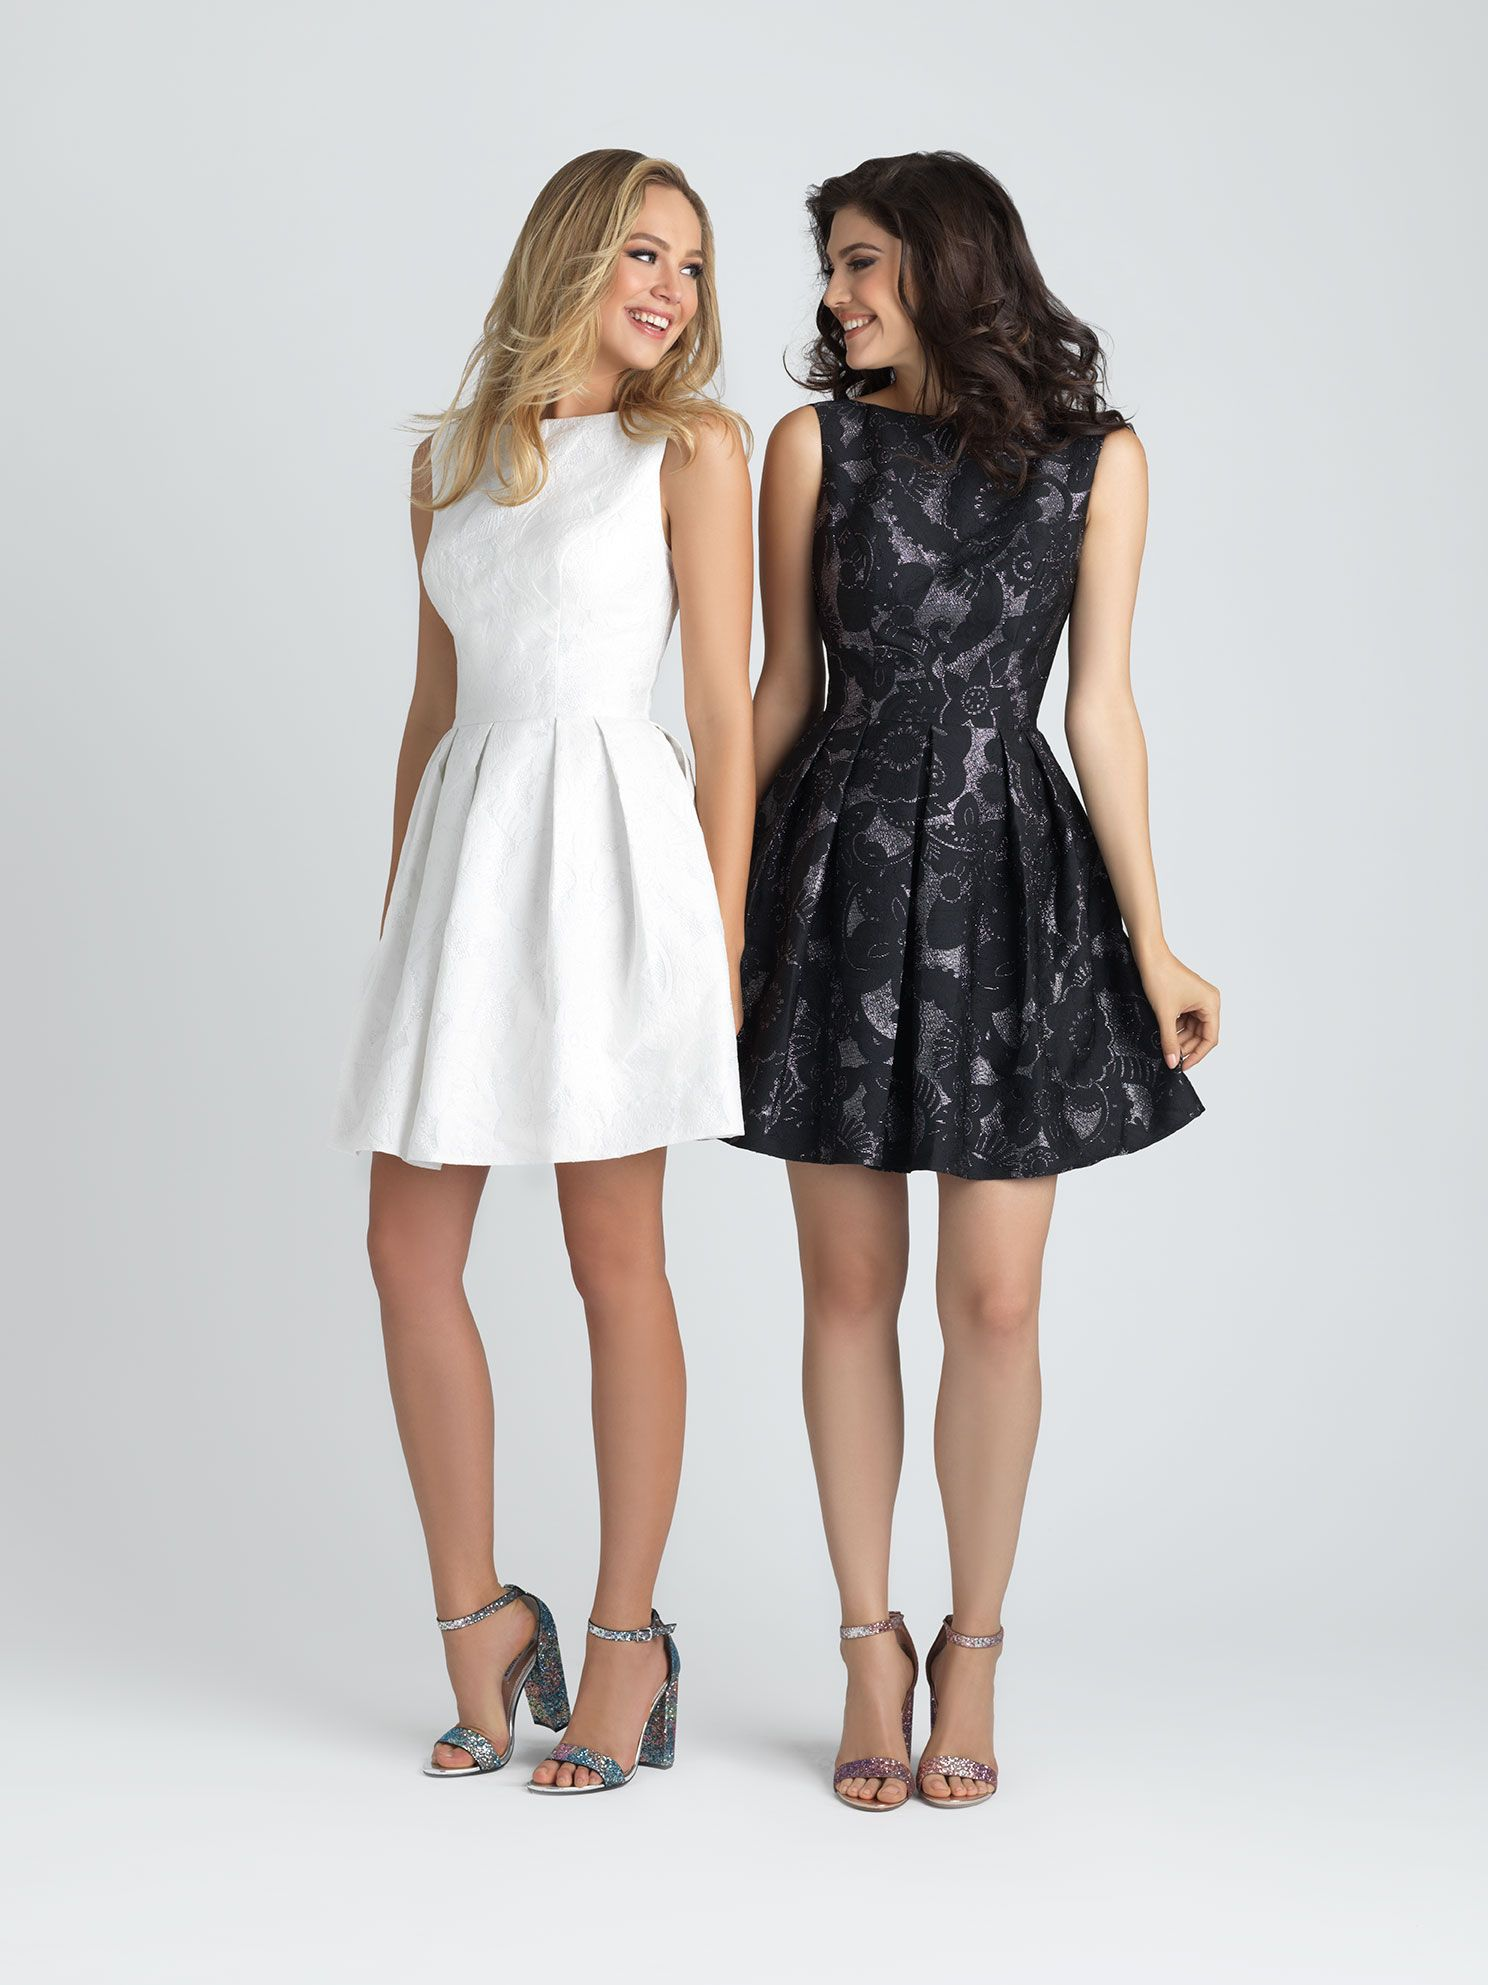 Pin de AmErica Maines en Bridesmaids dresses | Pinterest